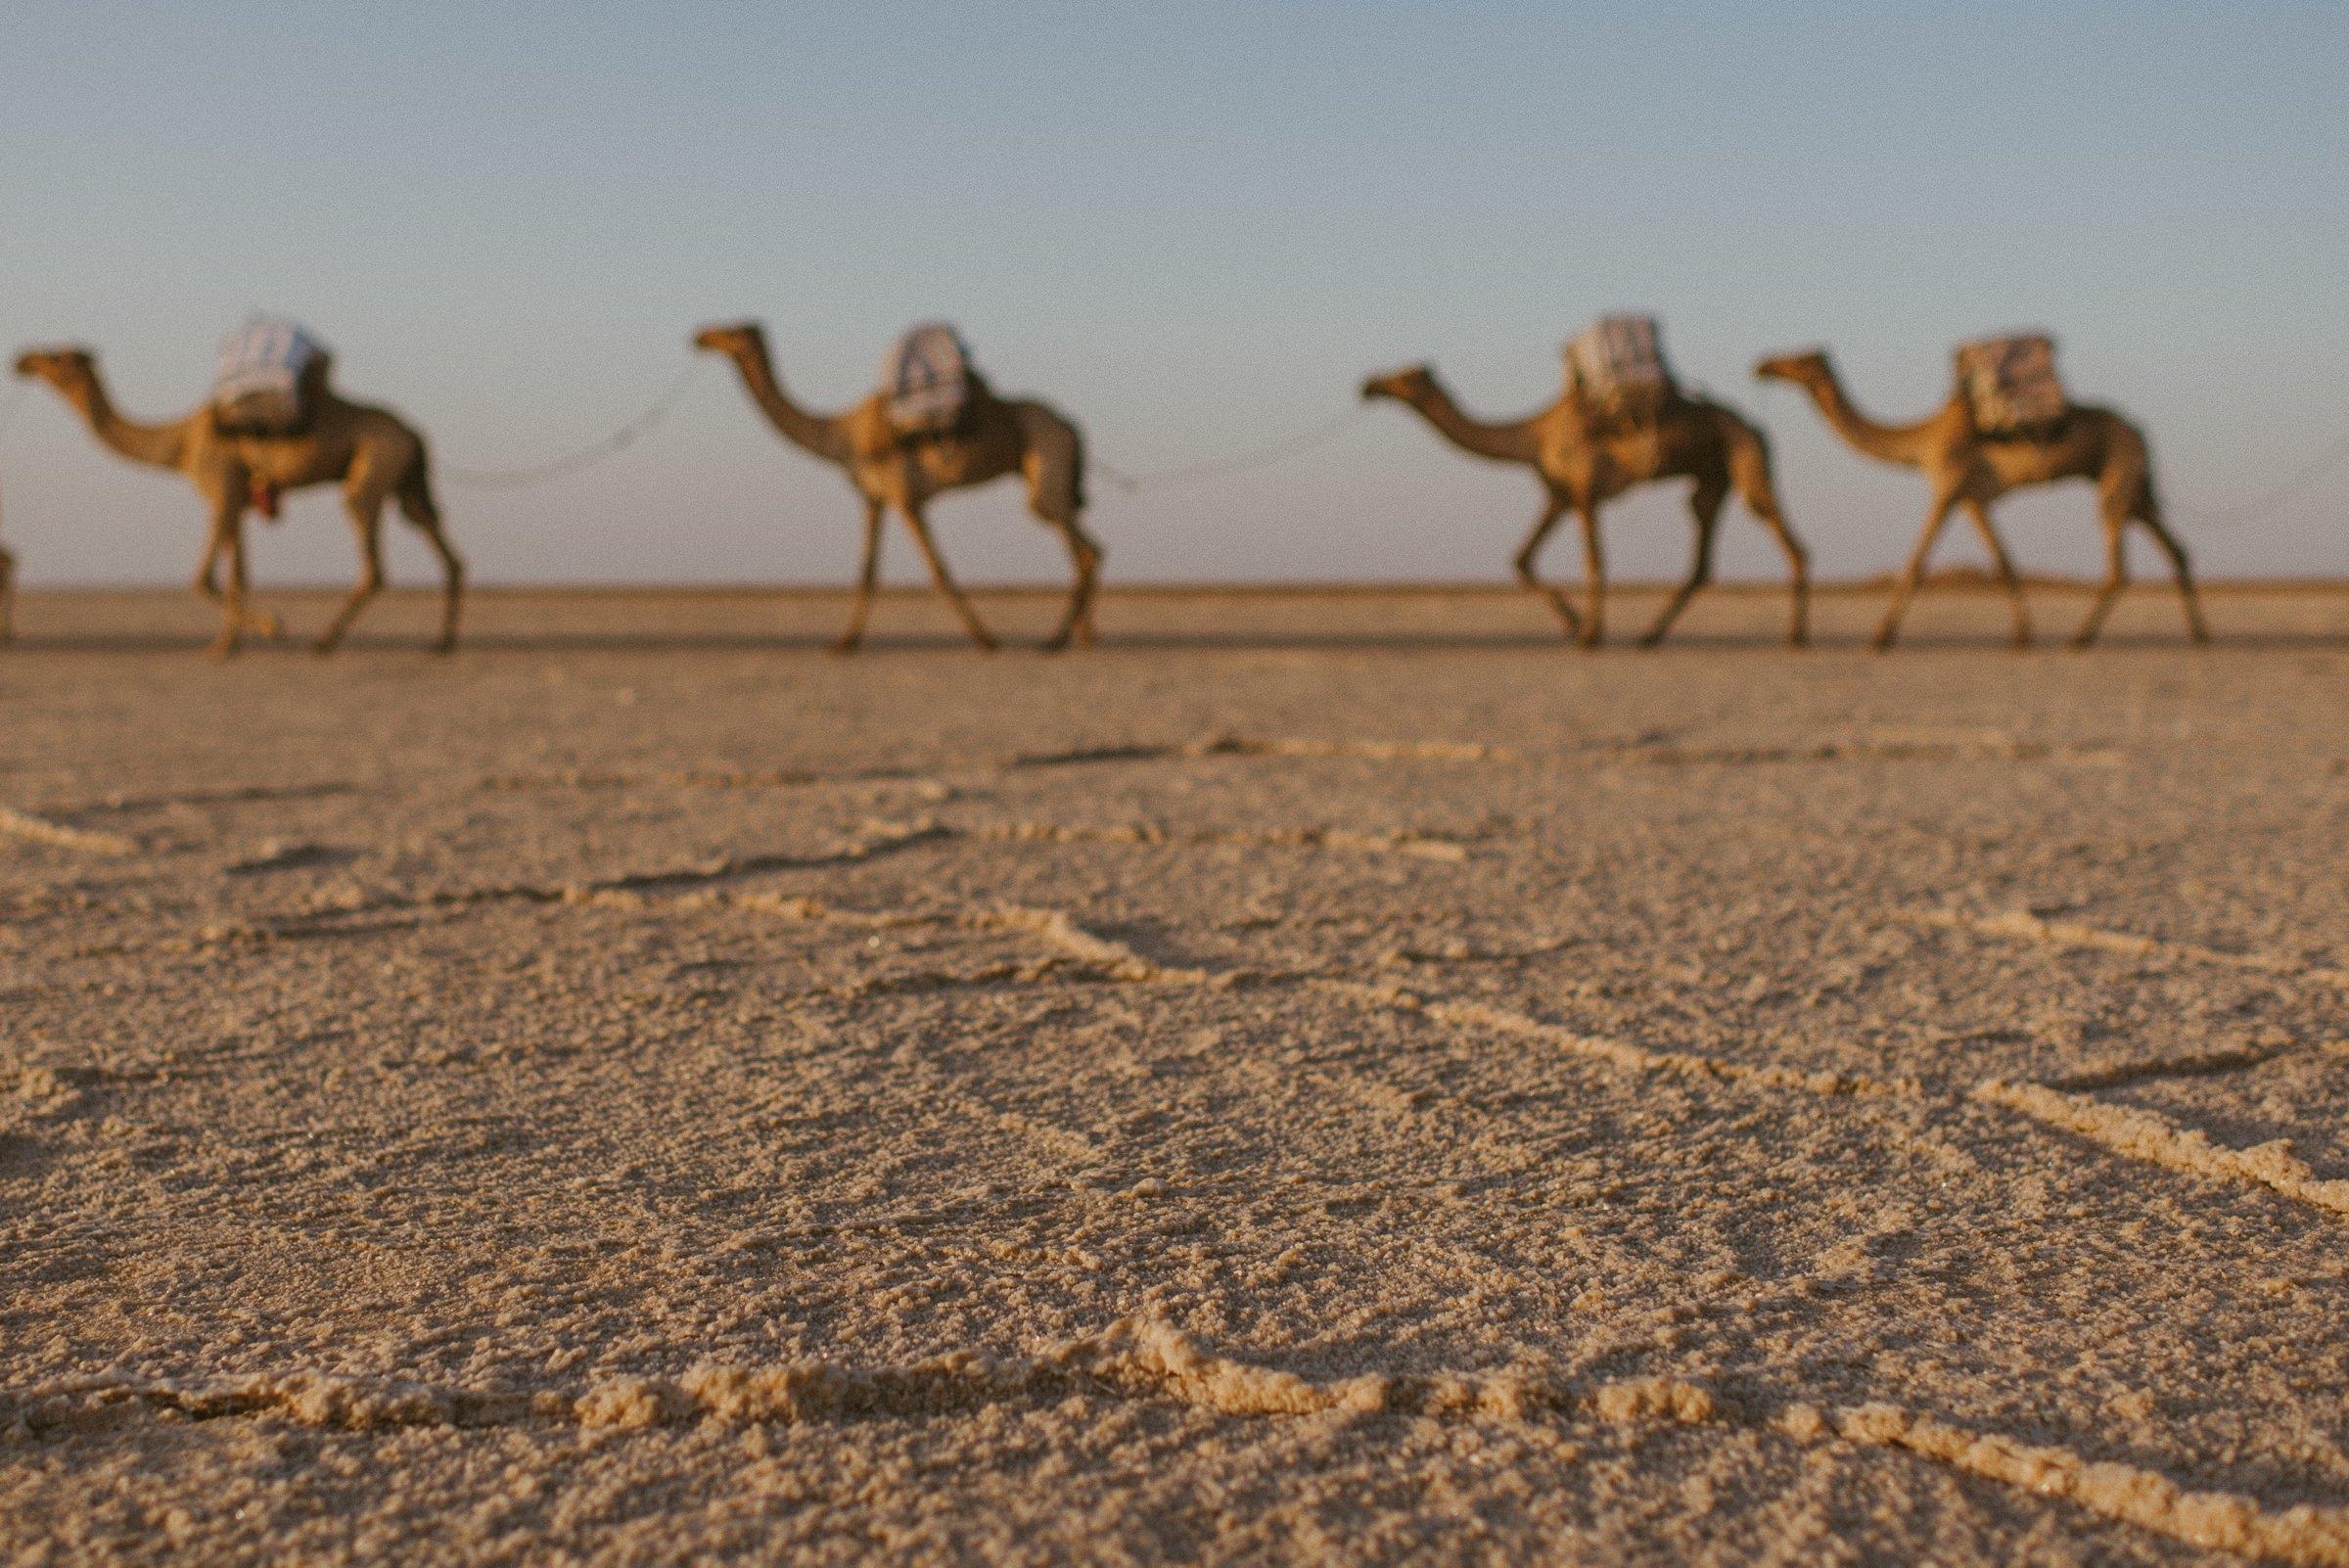 Kamele, Lastentiere, Salzwüste, Danakil Depression